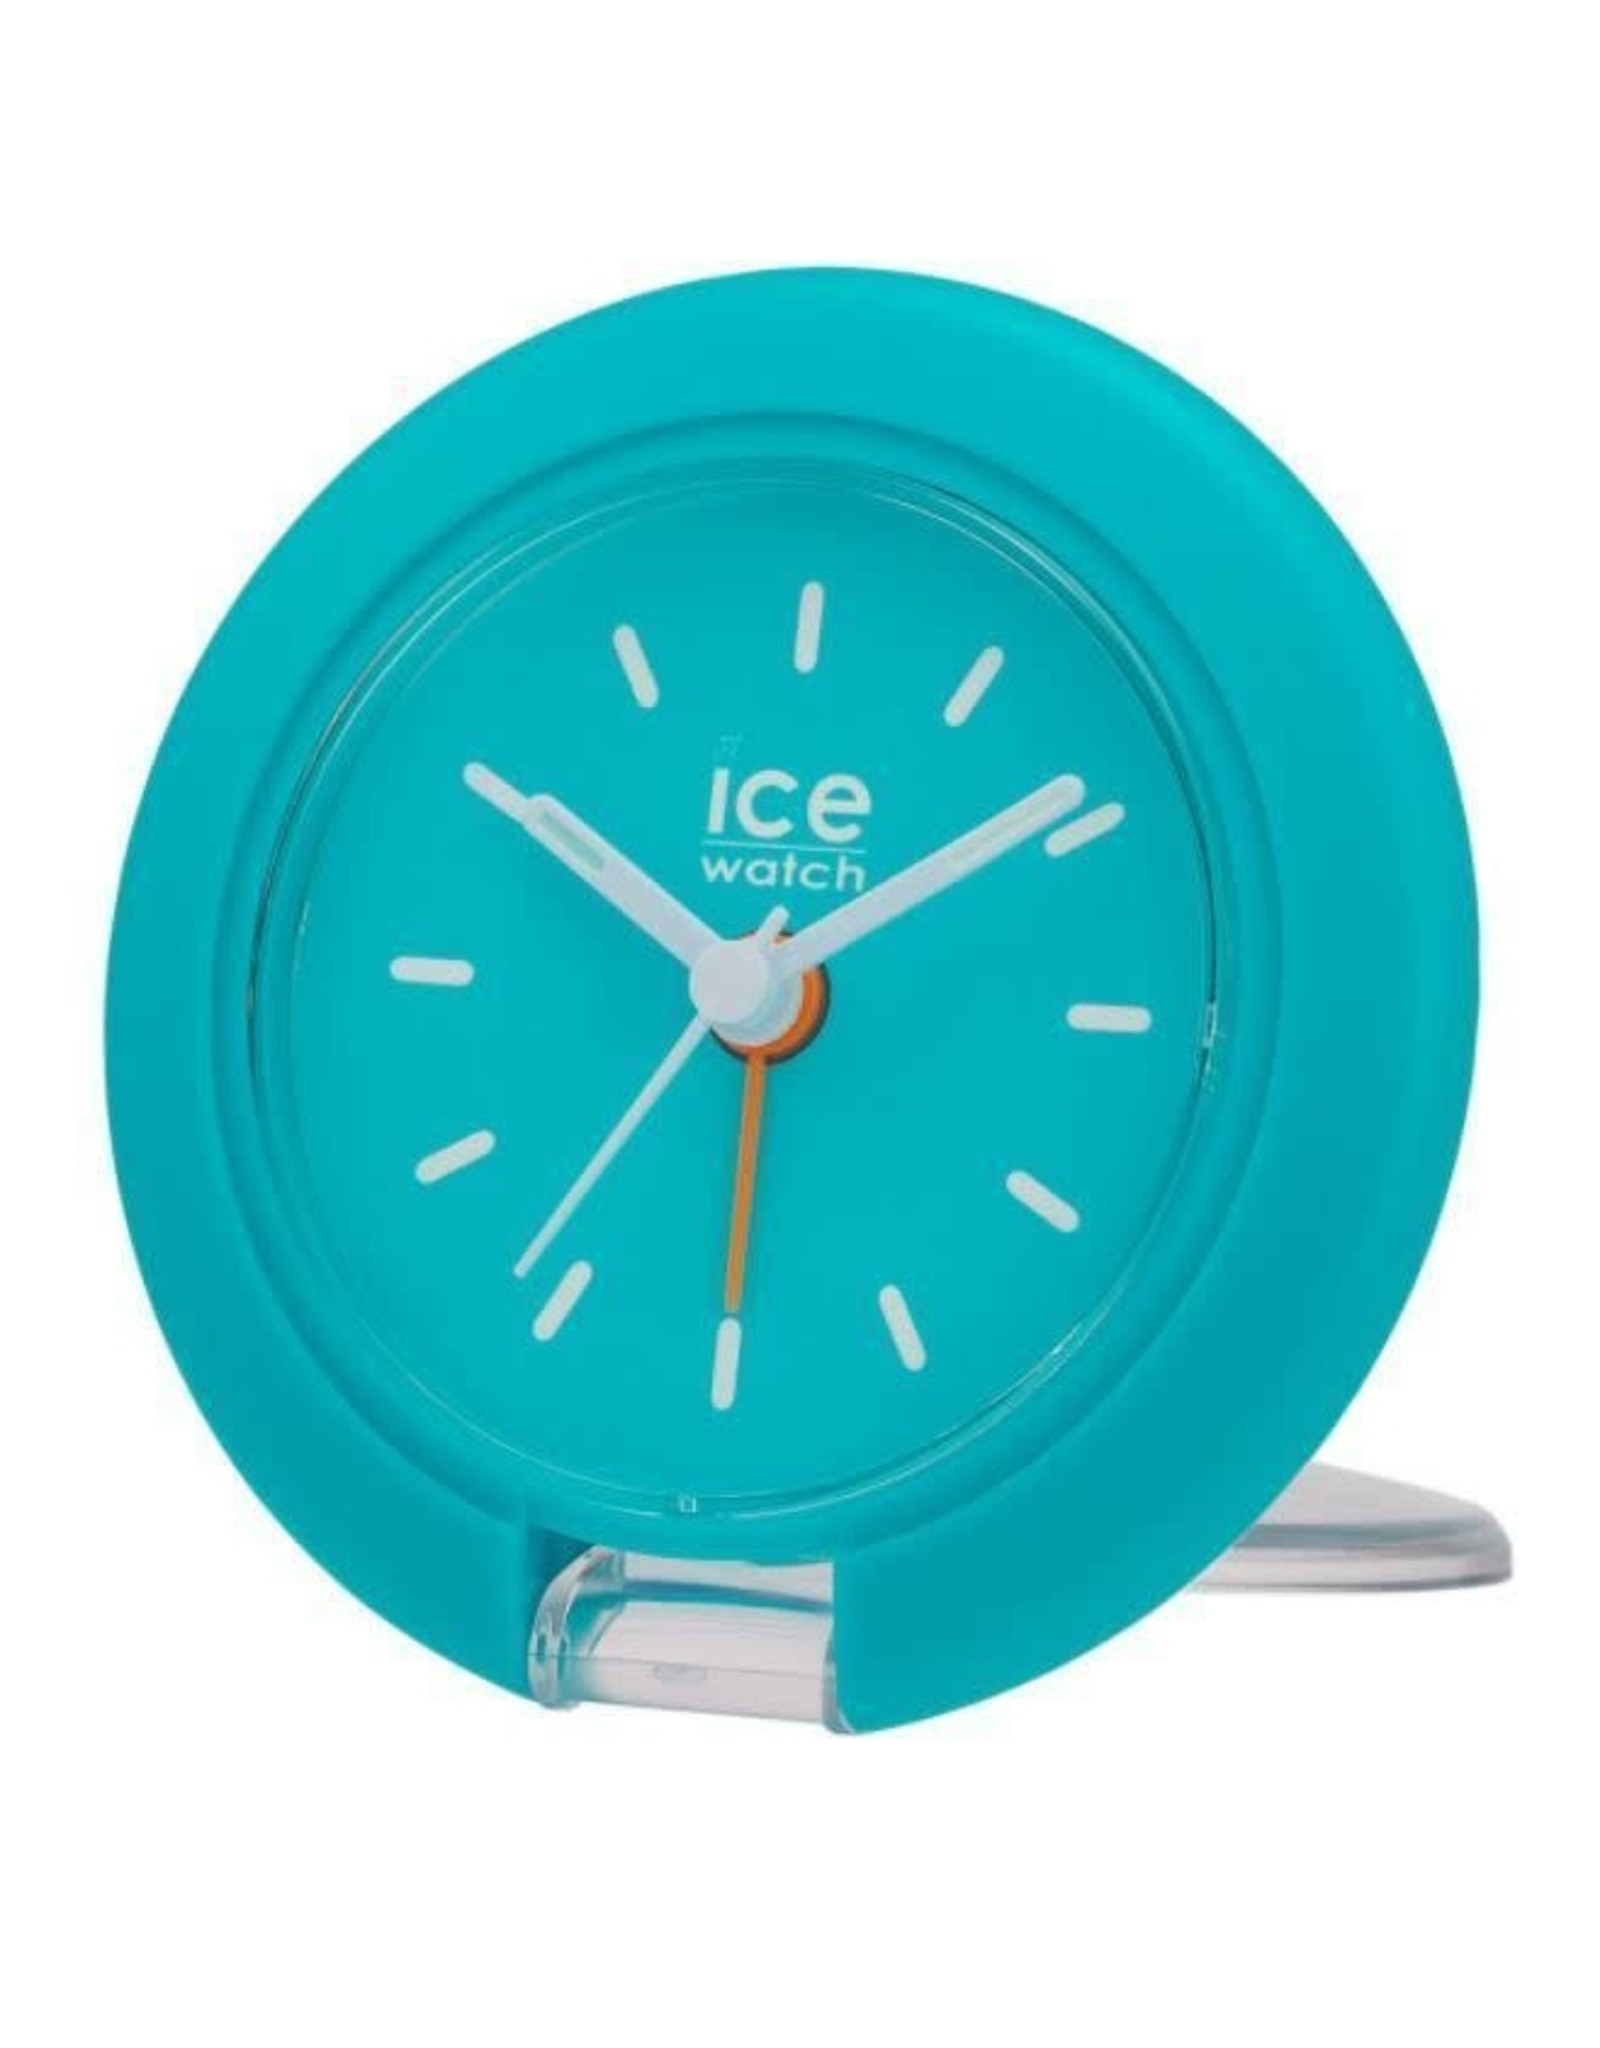 Ice Watch Reiswekker Ice Watch 15209 Turquoise 7.5cm